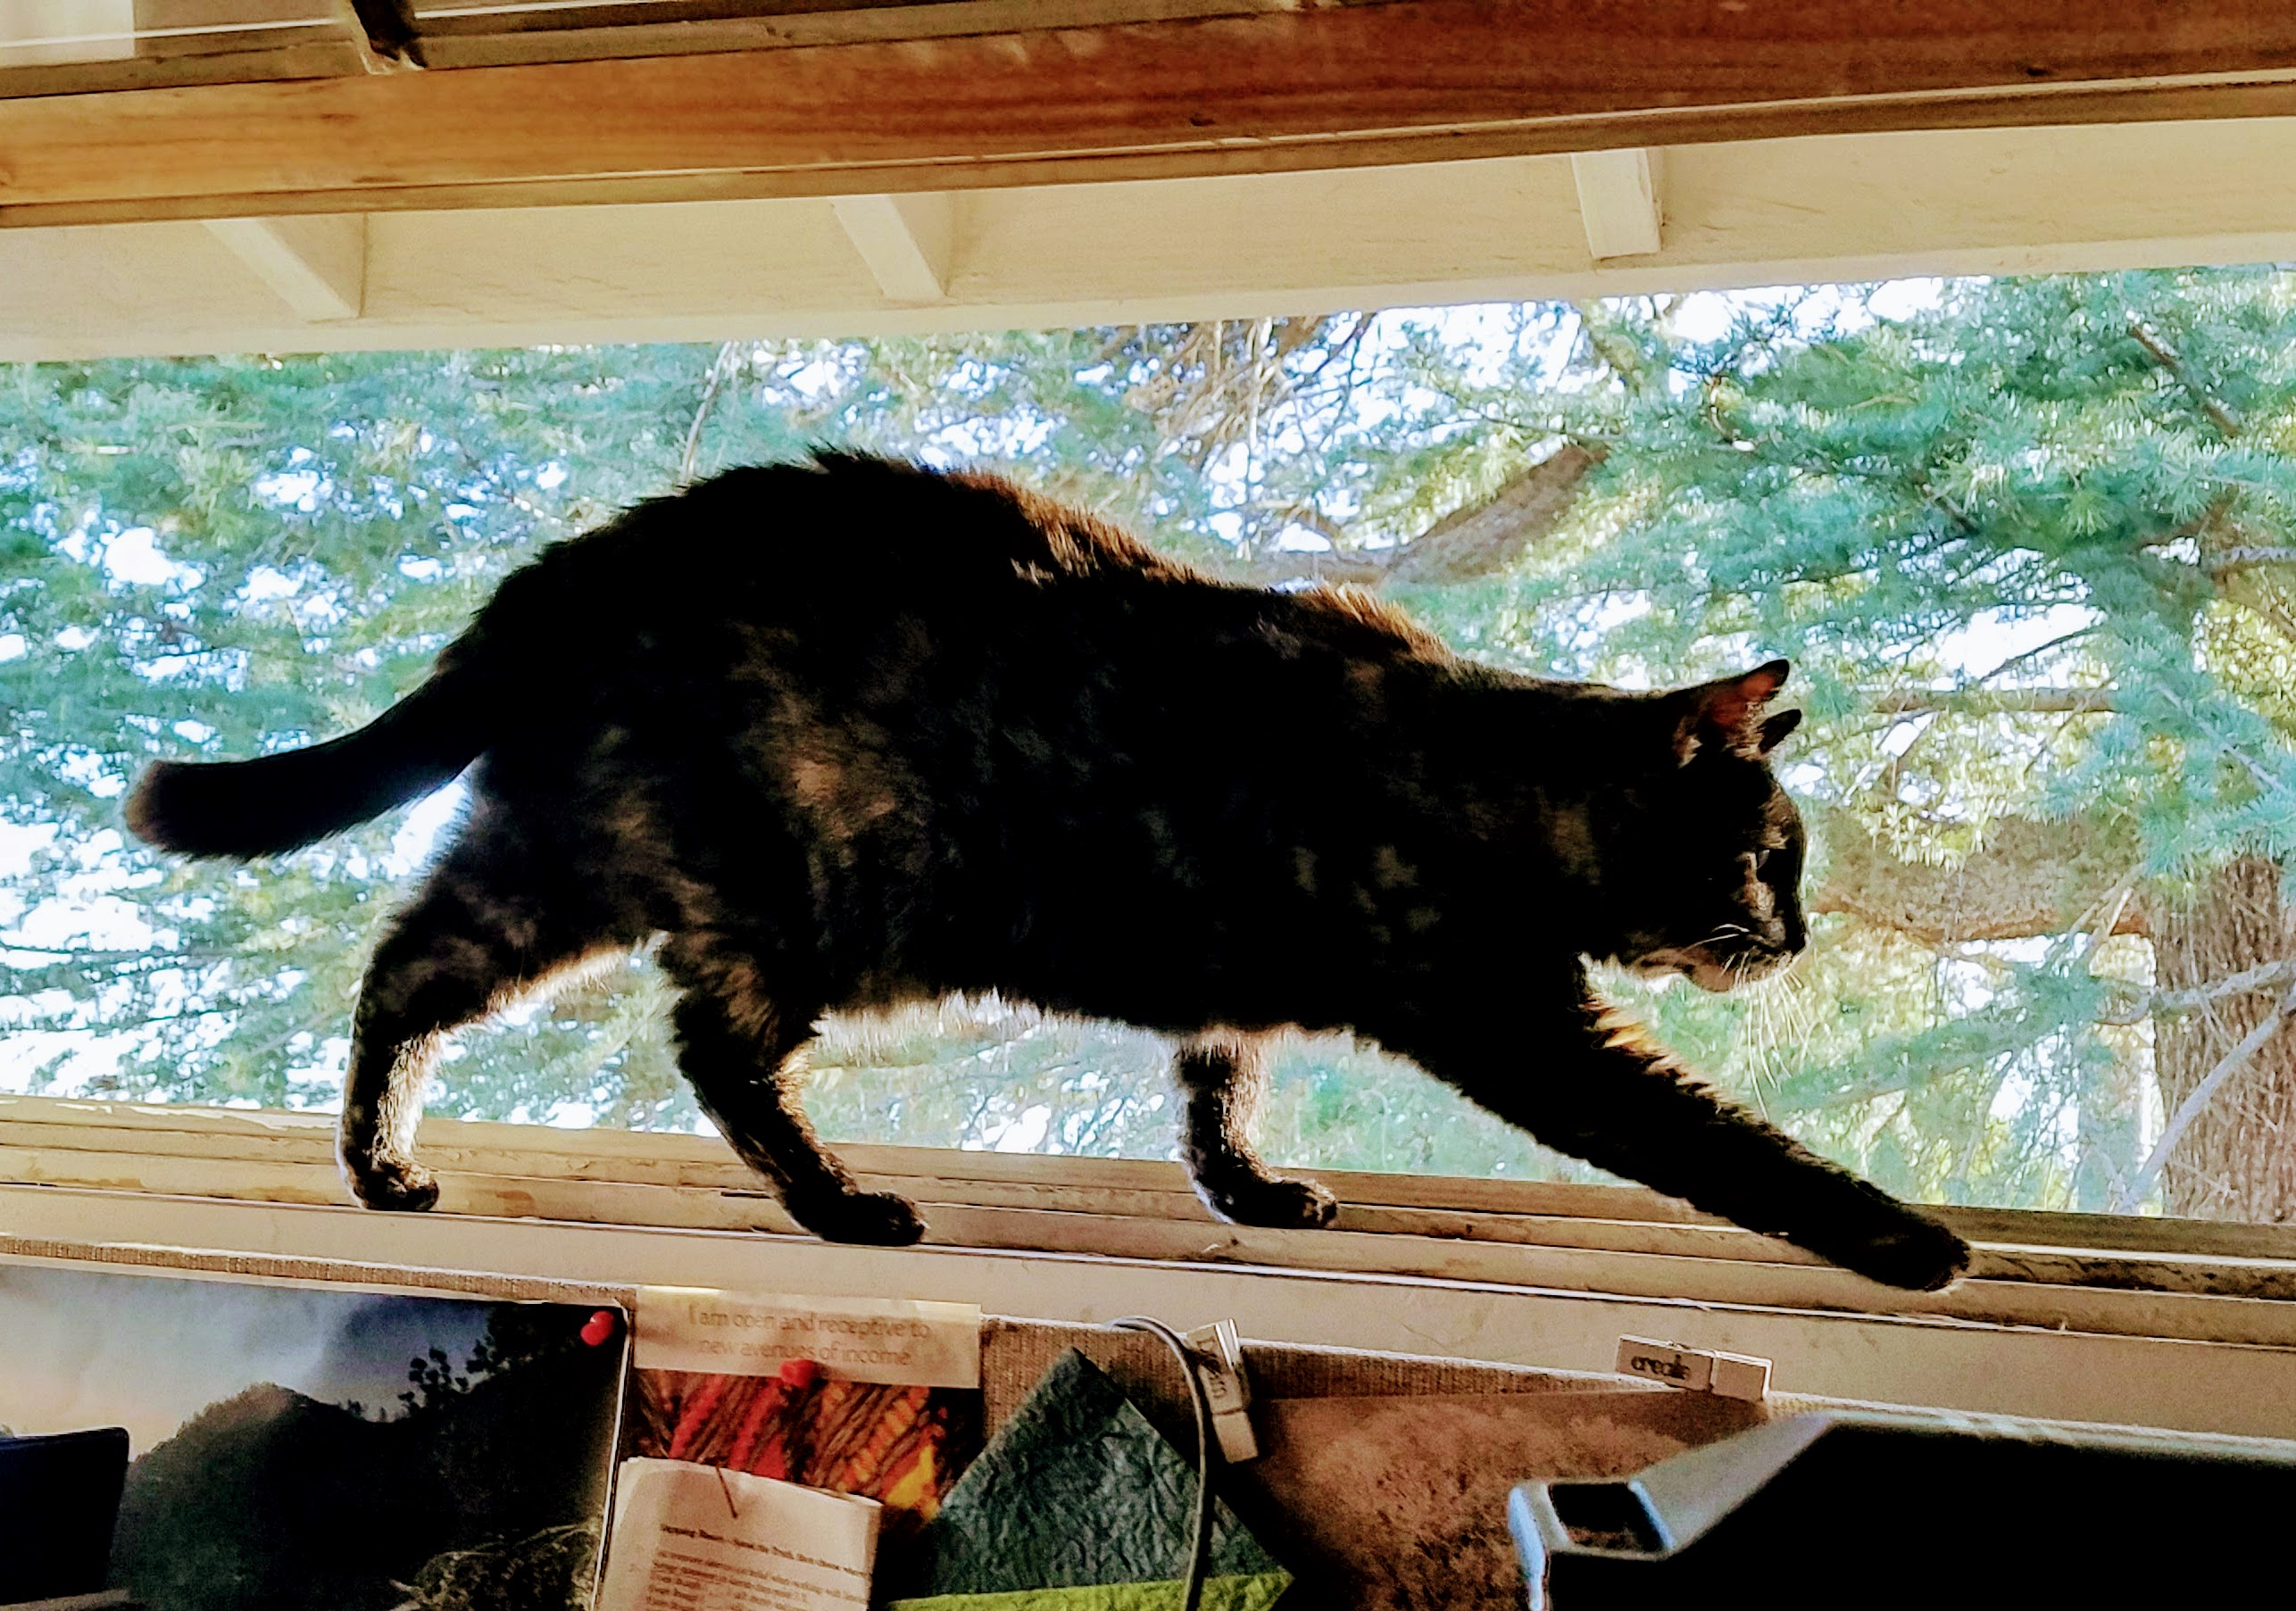 Cat stalking prey